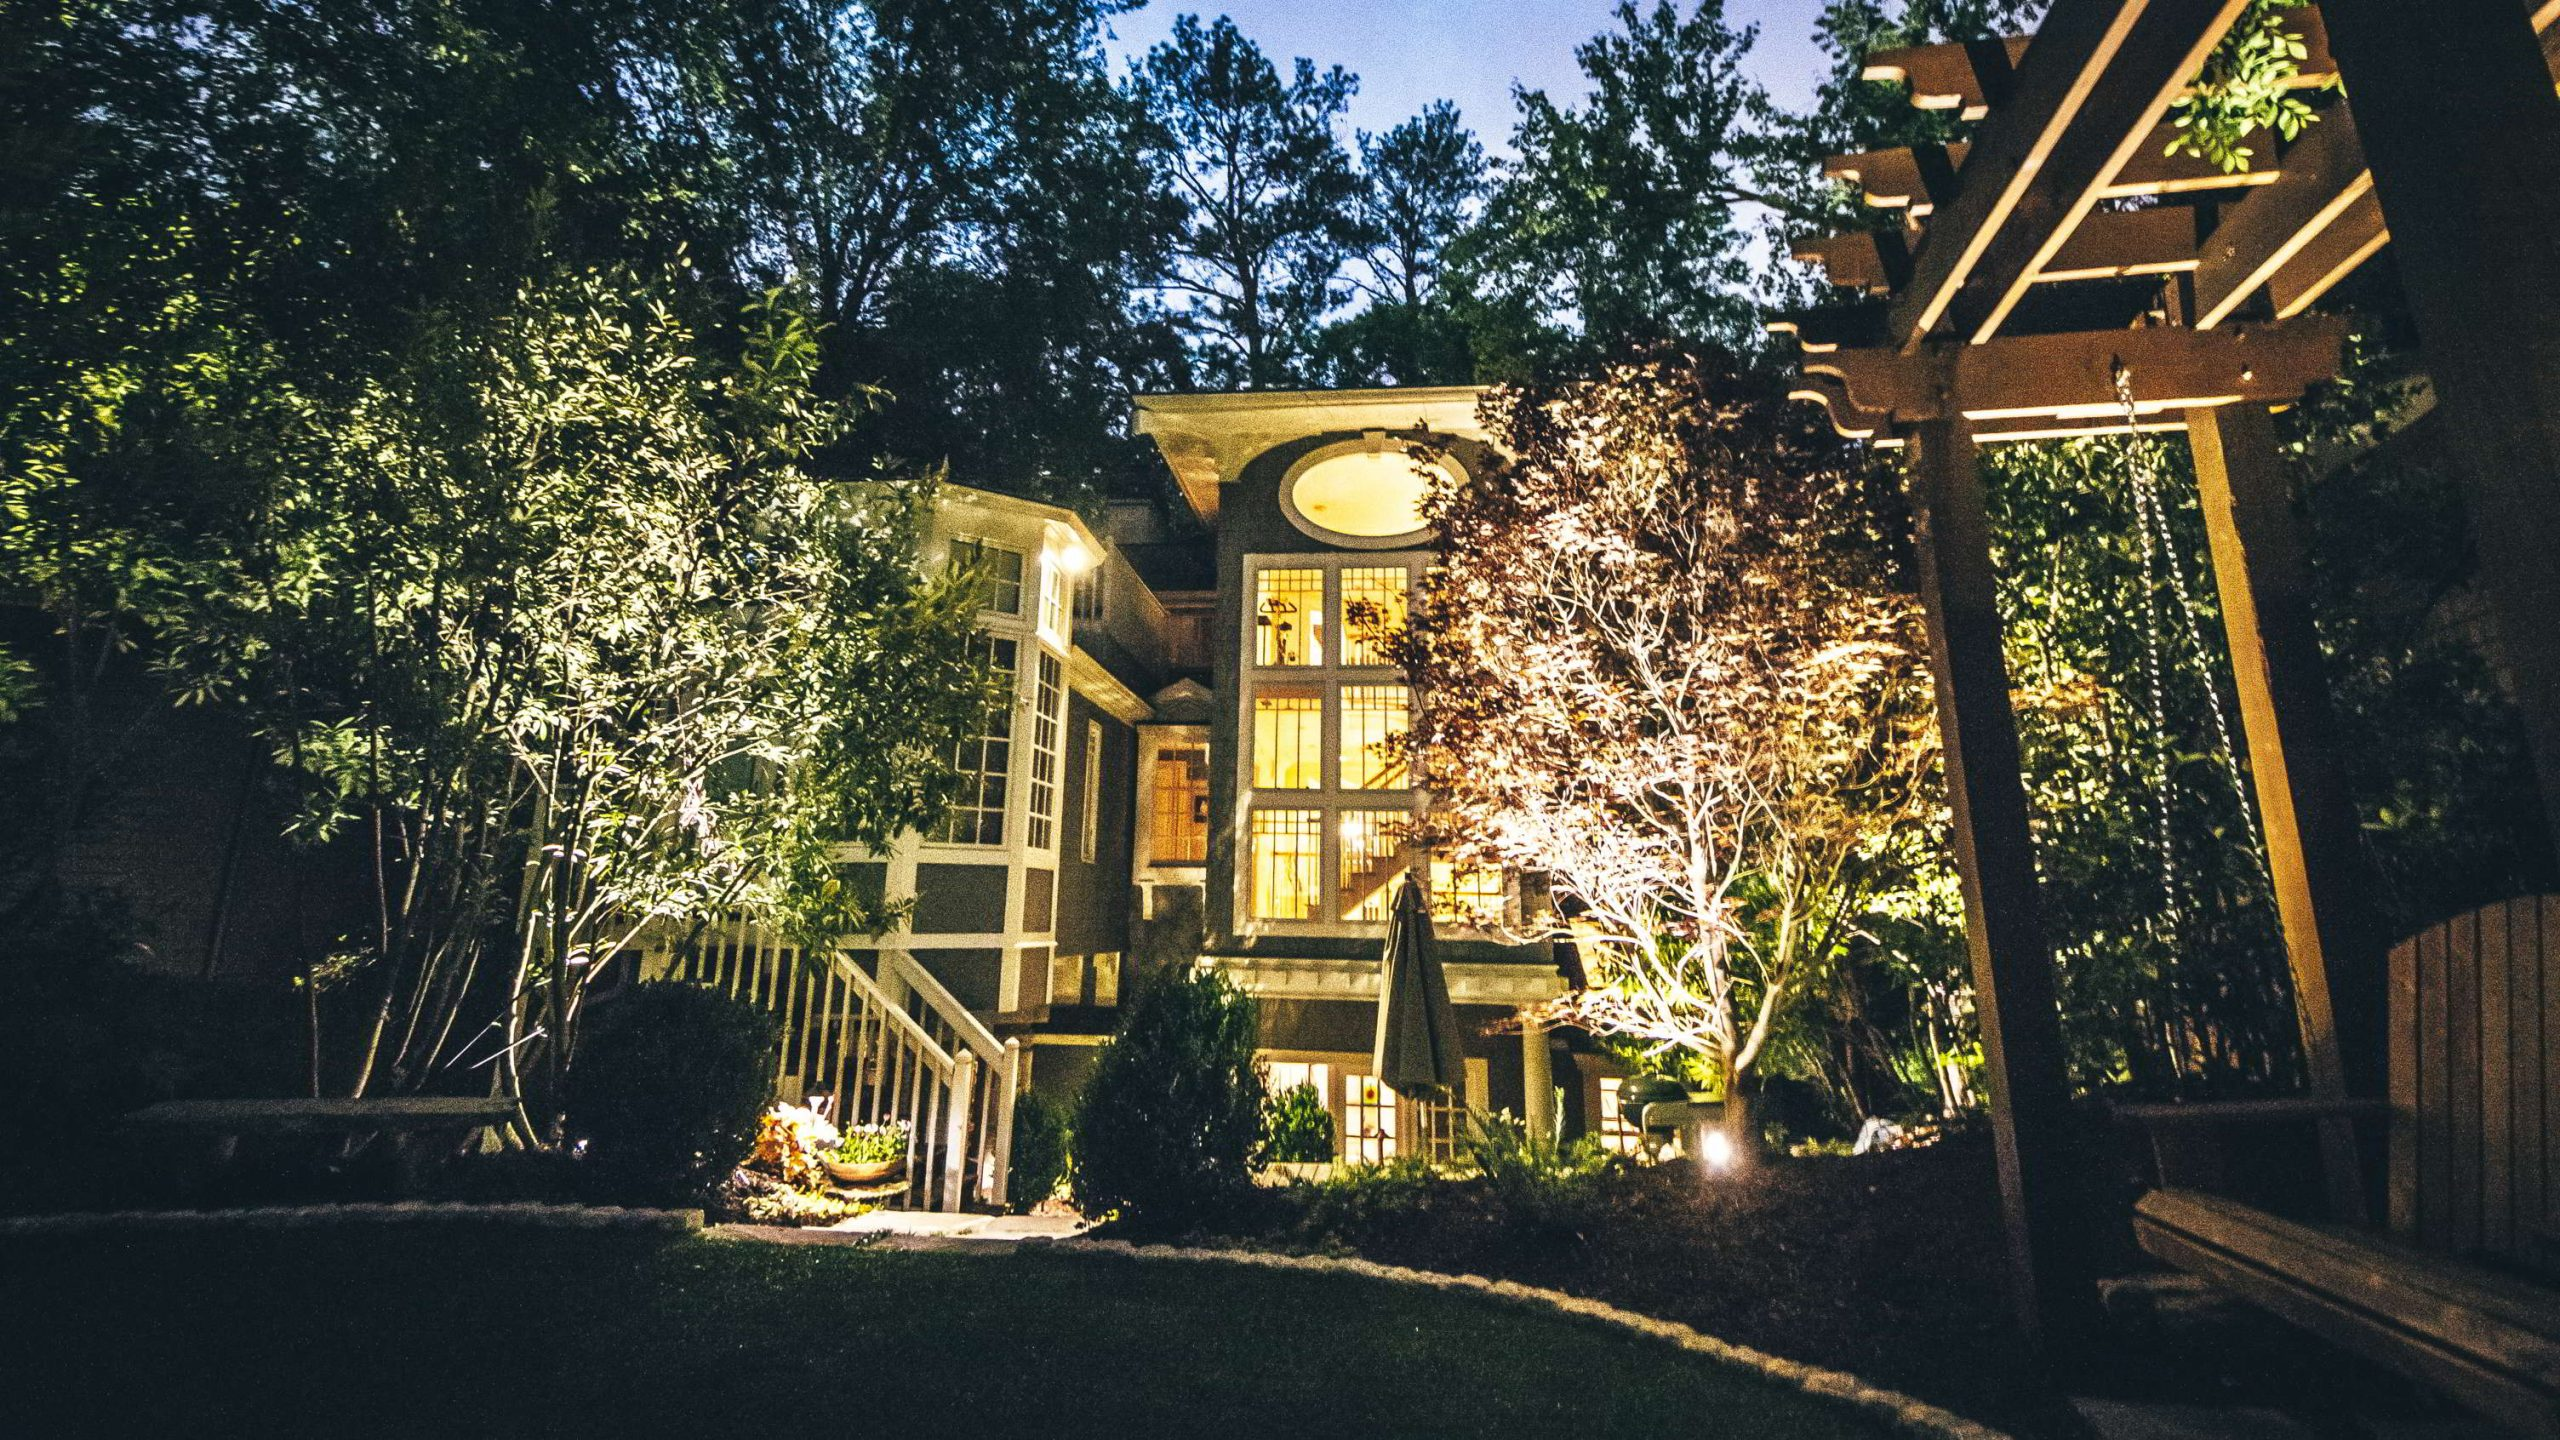 outdoor Atlanta home lighting design at night